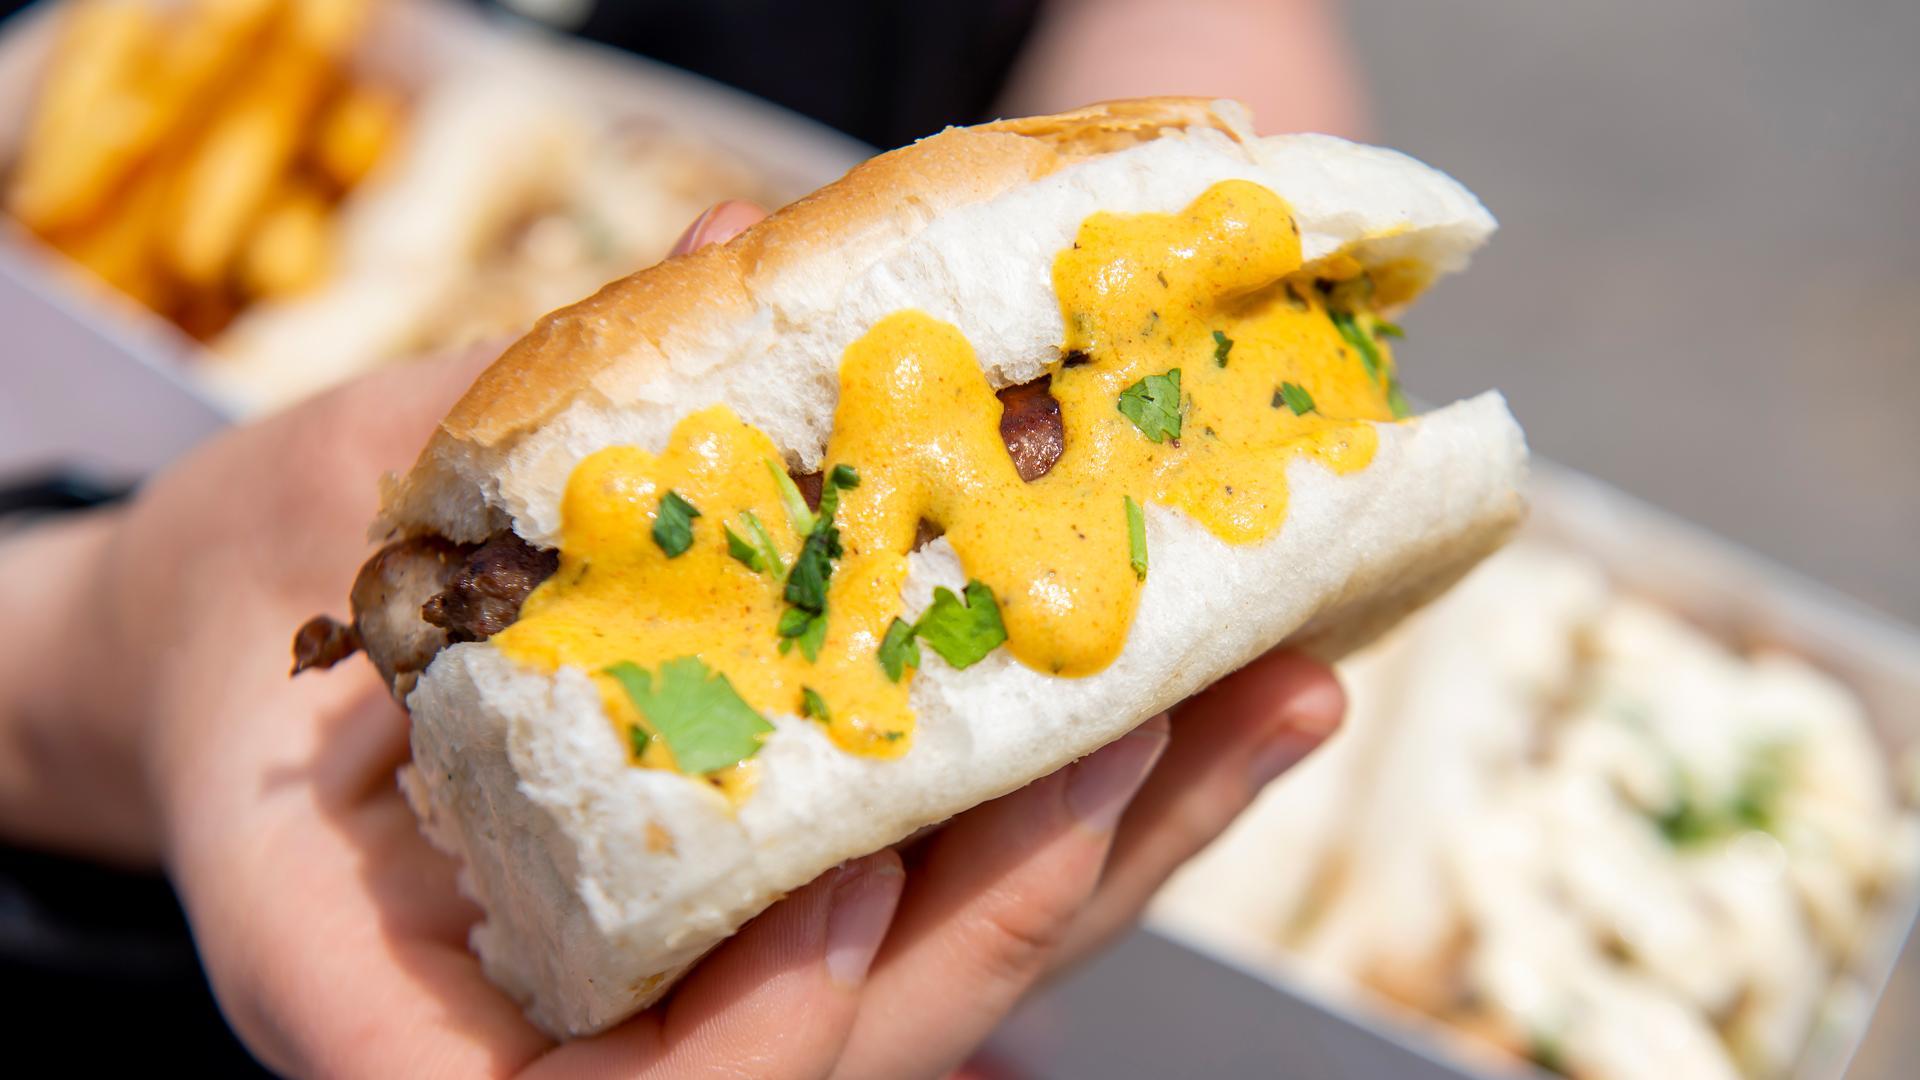 The best Toronto food markets   A sandwich from Tut's at Street Eats market